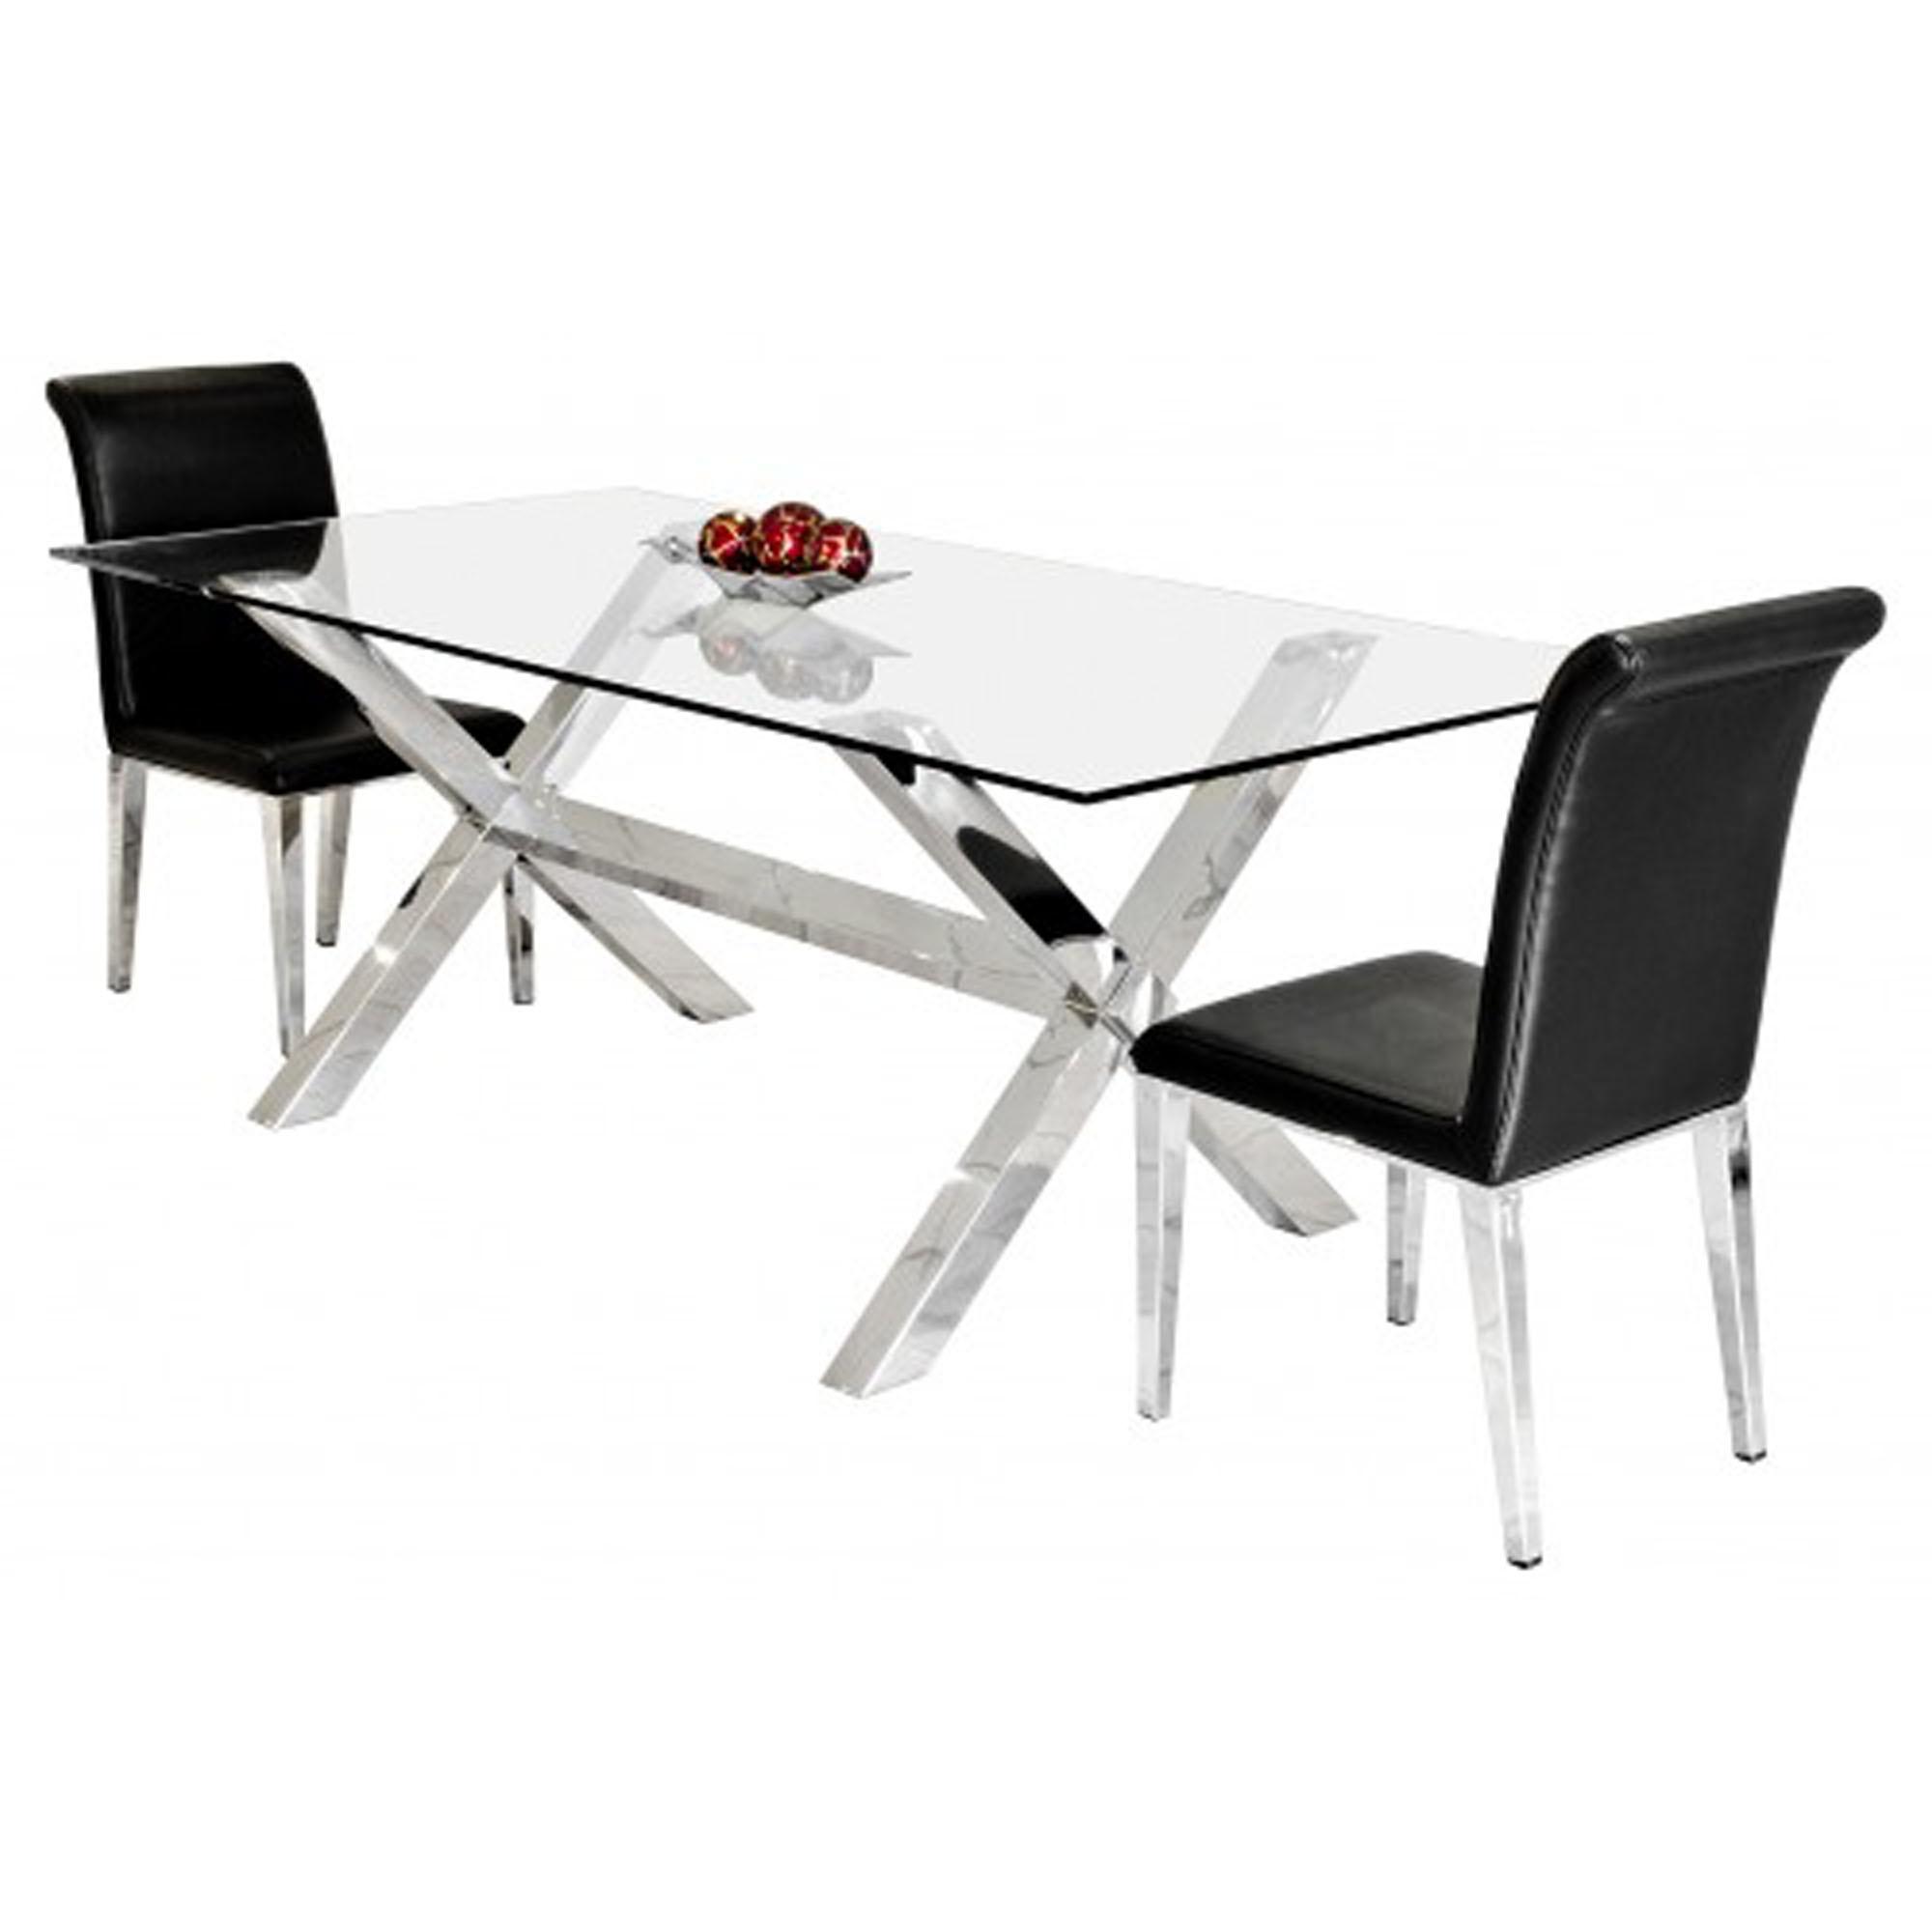 Popular Contemporary Rectangular Dining Tables For Crossly Rectangular Dining Table (View 15 of 25)